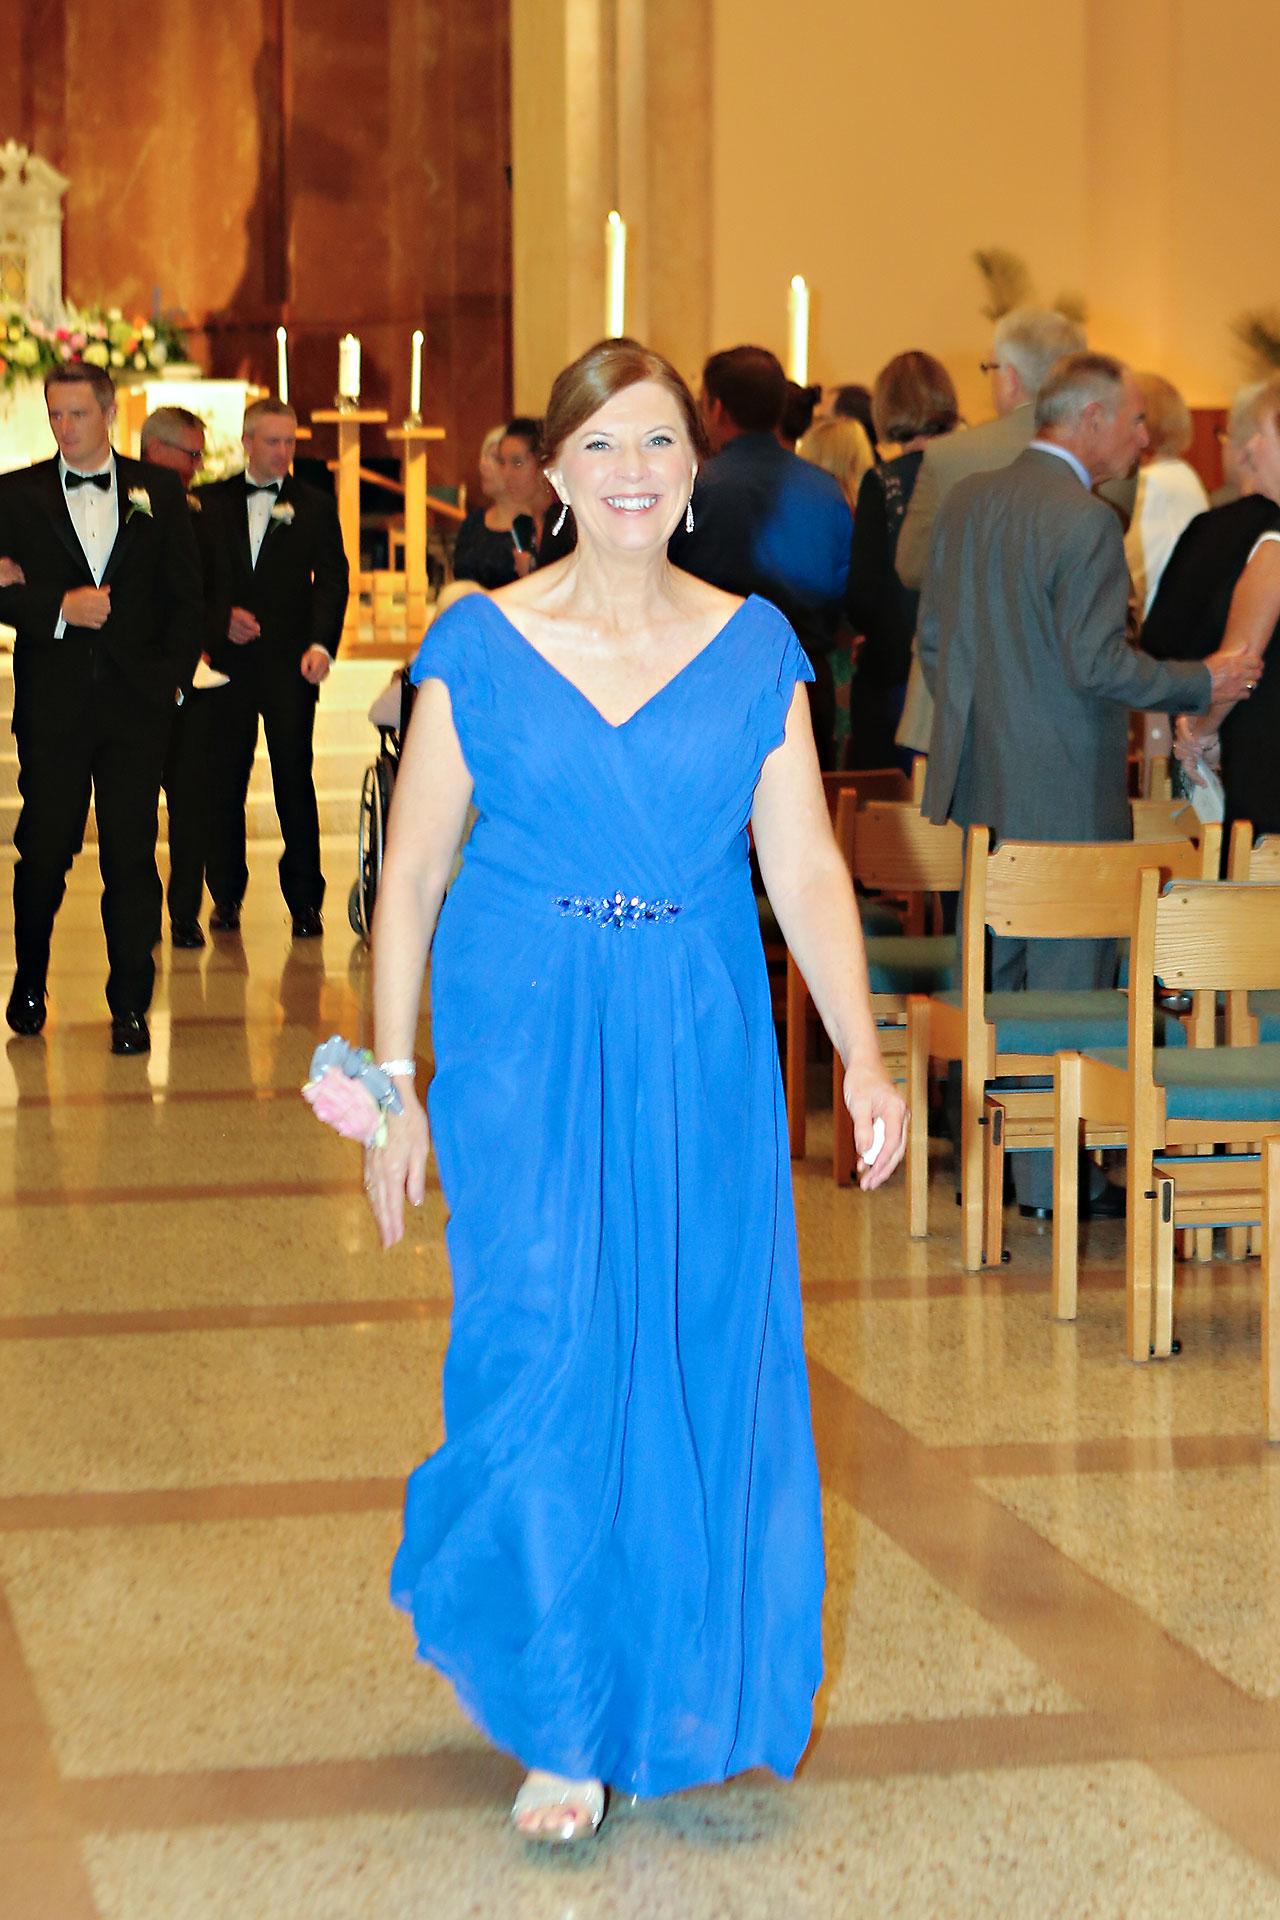 Kathleen Ben Indianapolis Museum of Art Wedding 110